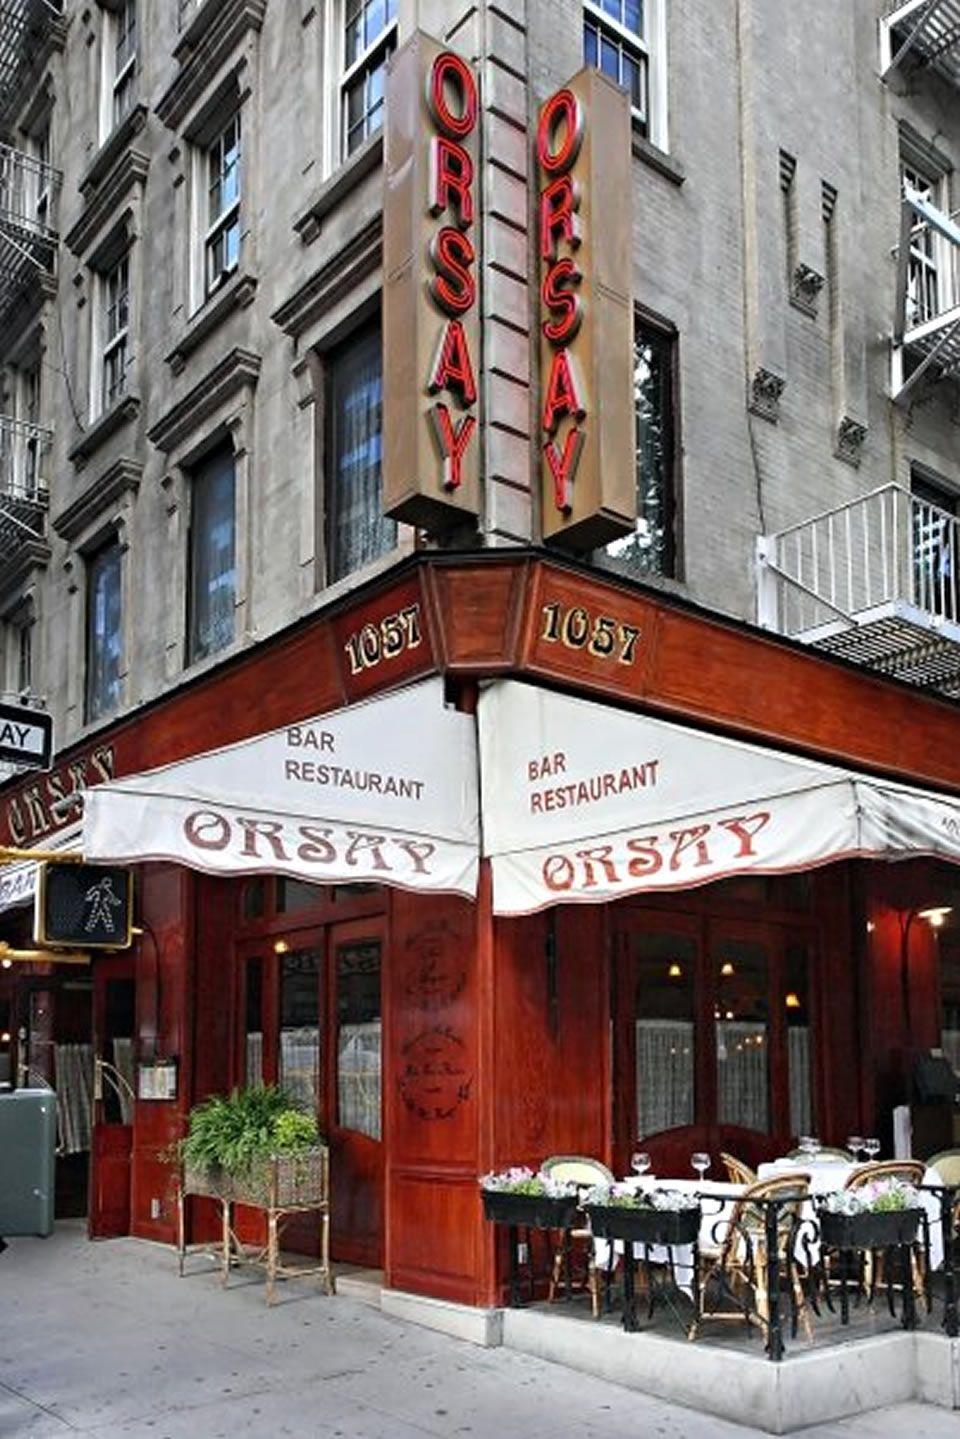 Orsay Restaurant New York Ny Google Search Restaurant Outdoor Restaurant Patio Outdoor Restaurant